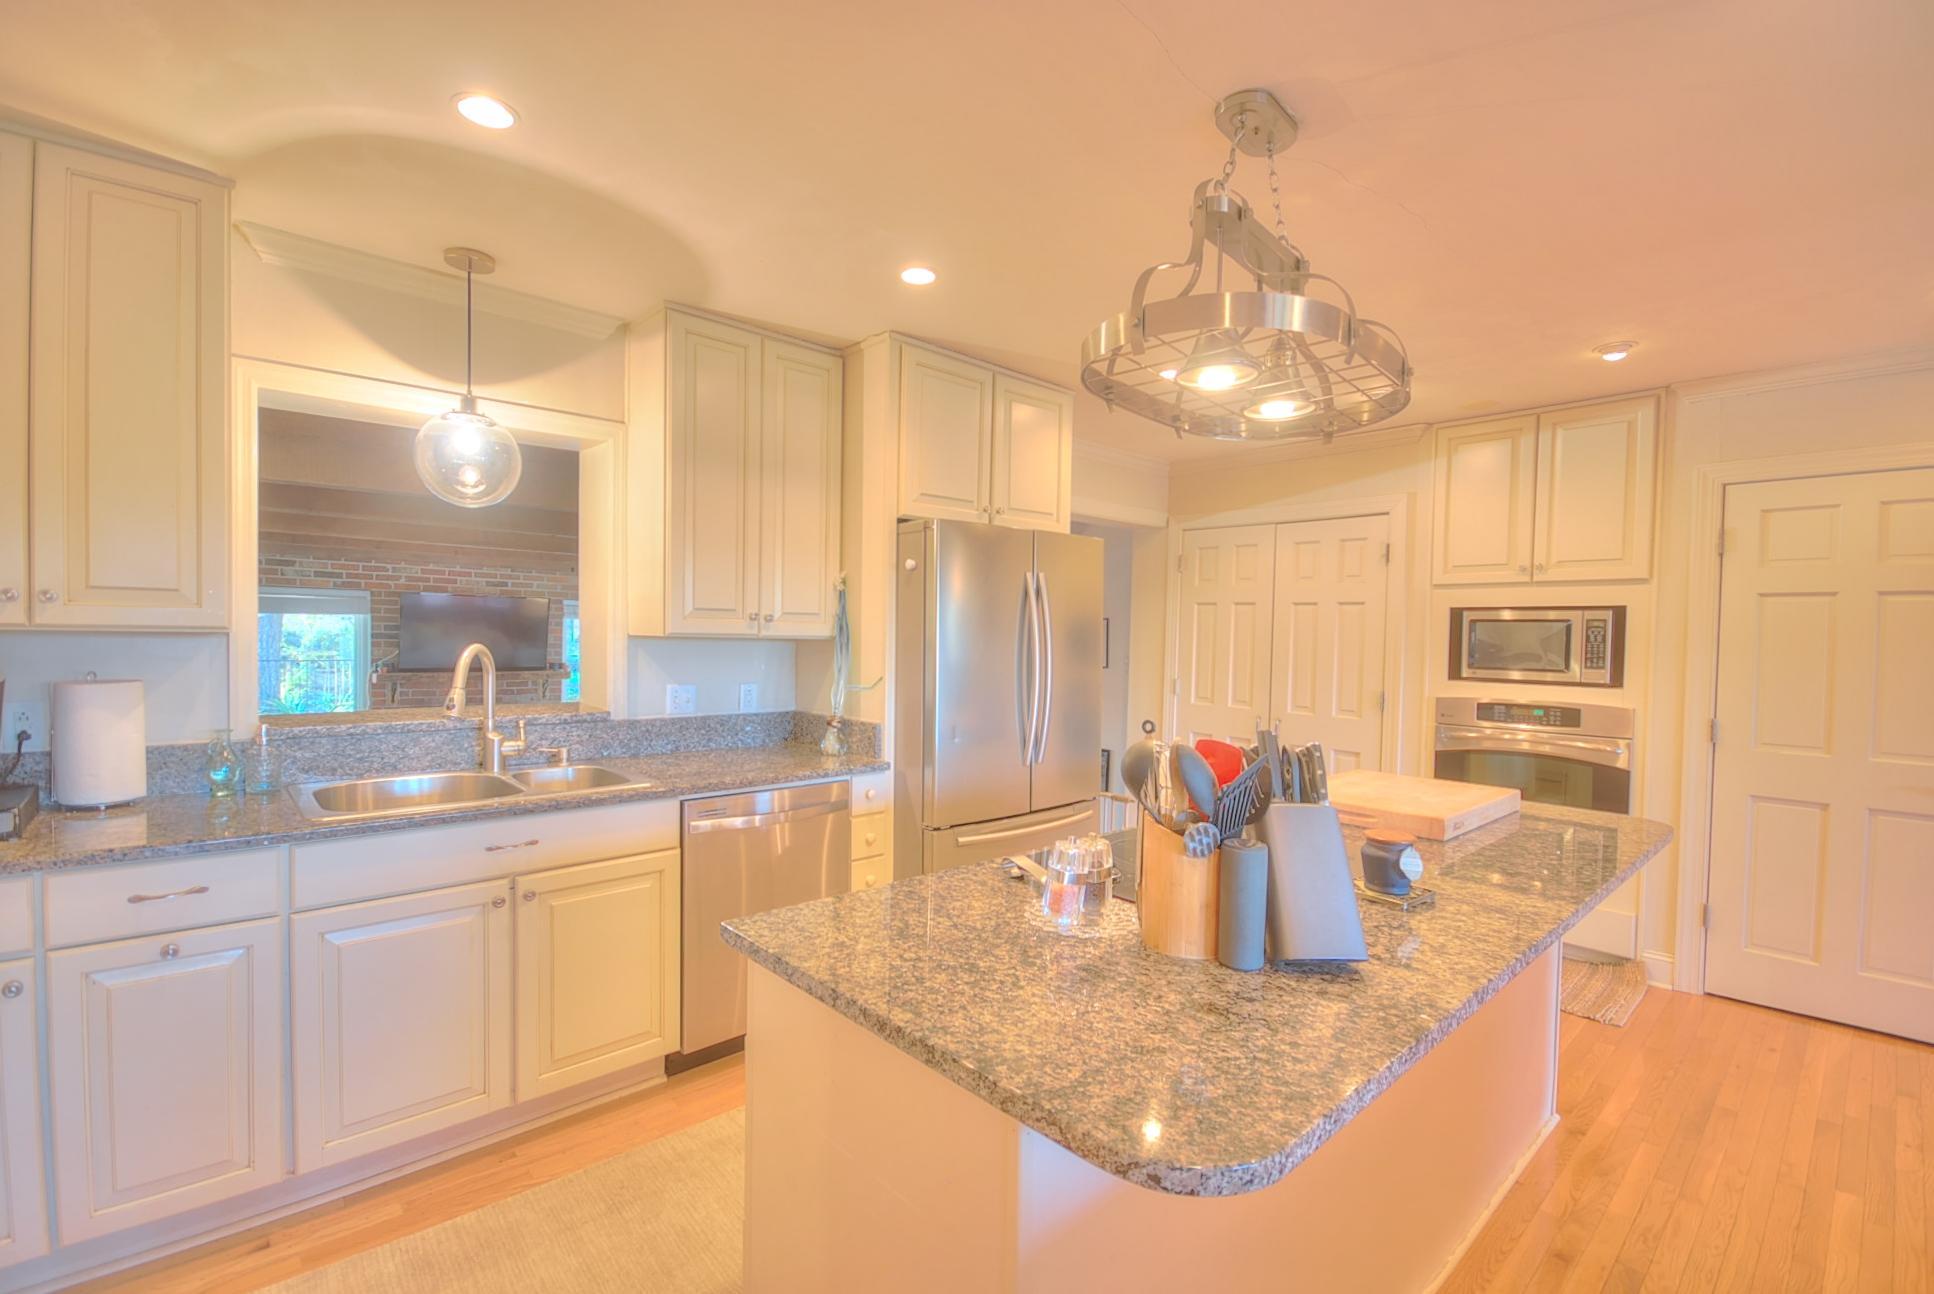 Capri Isles Homes For Sale - 213 Wappoo, Charleston, SC - 47